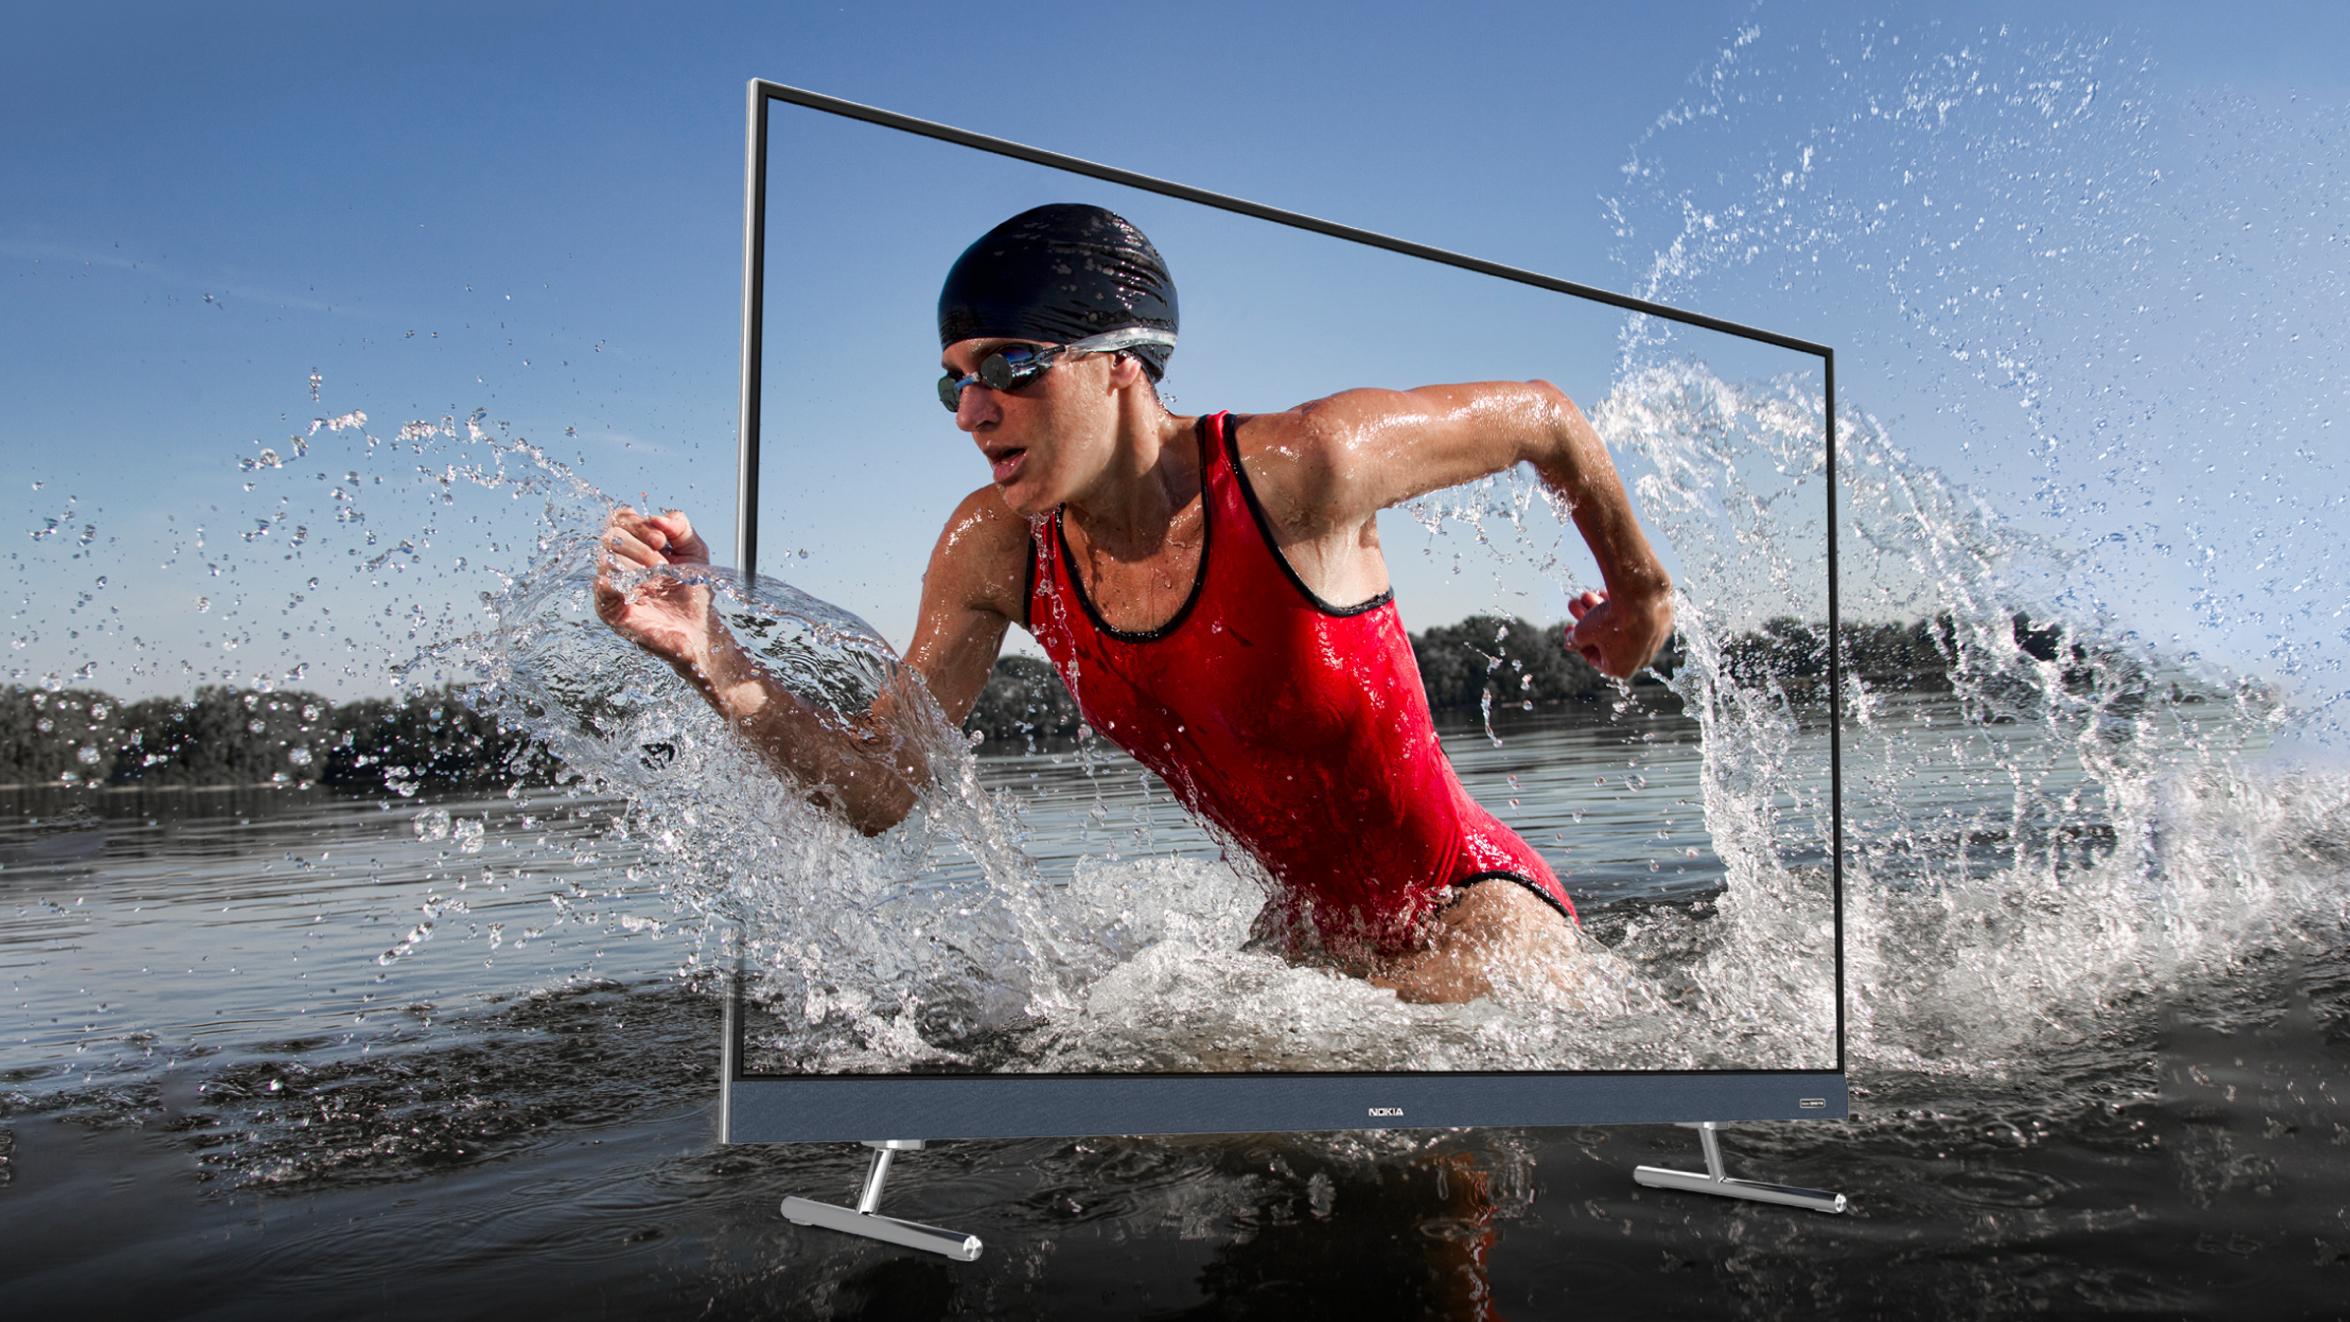 New Nokia Smart TV 1